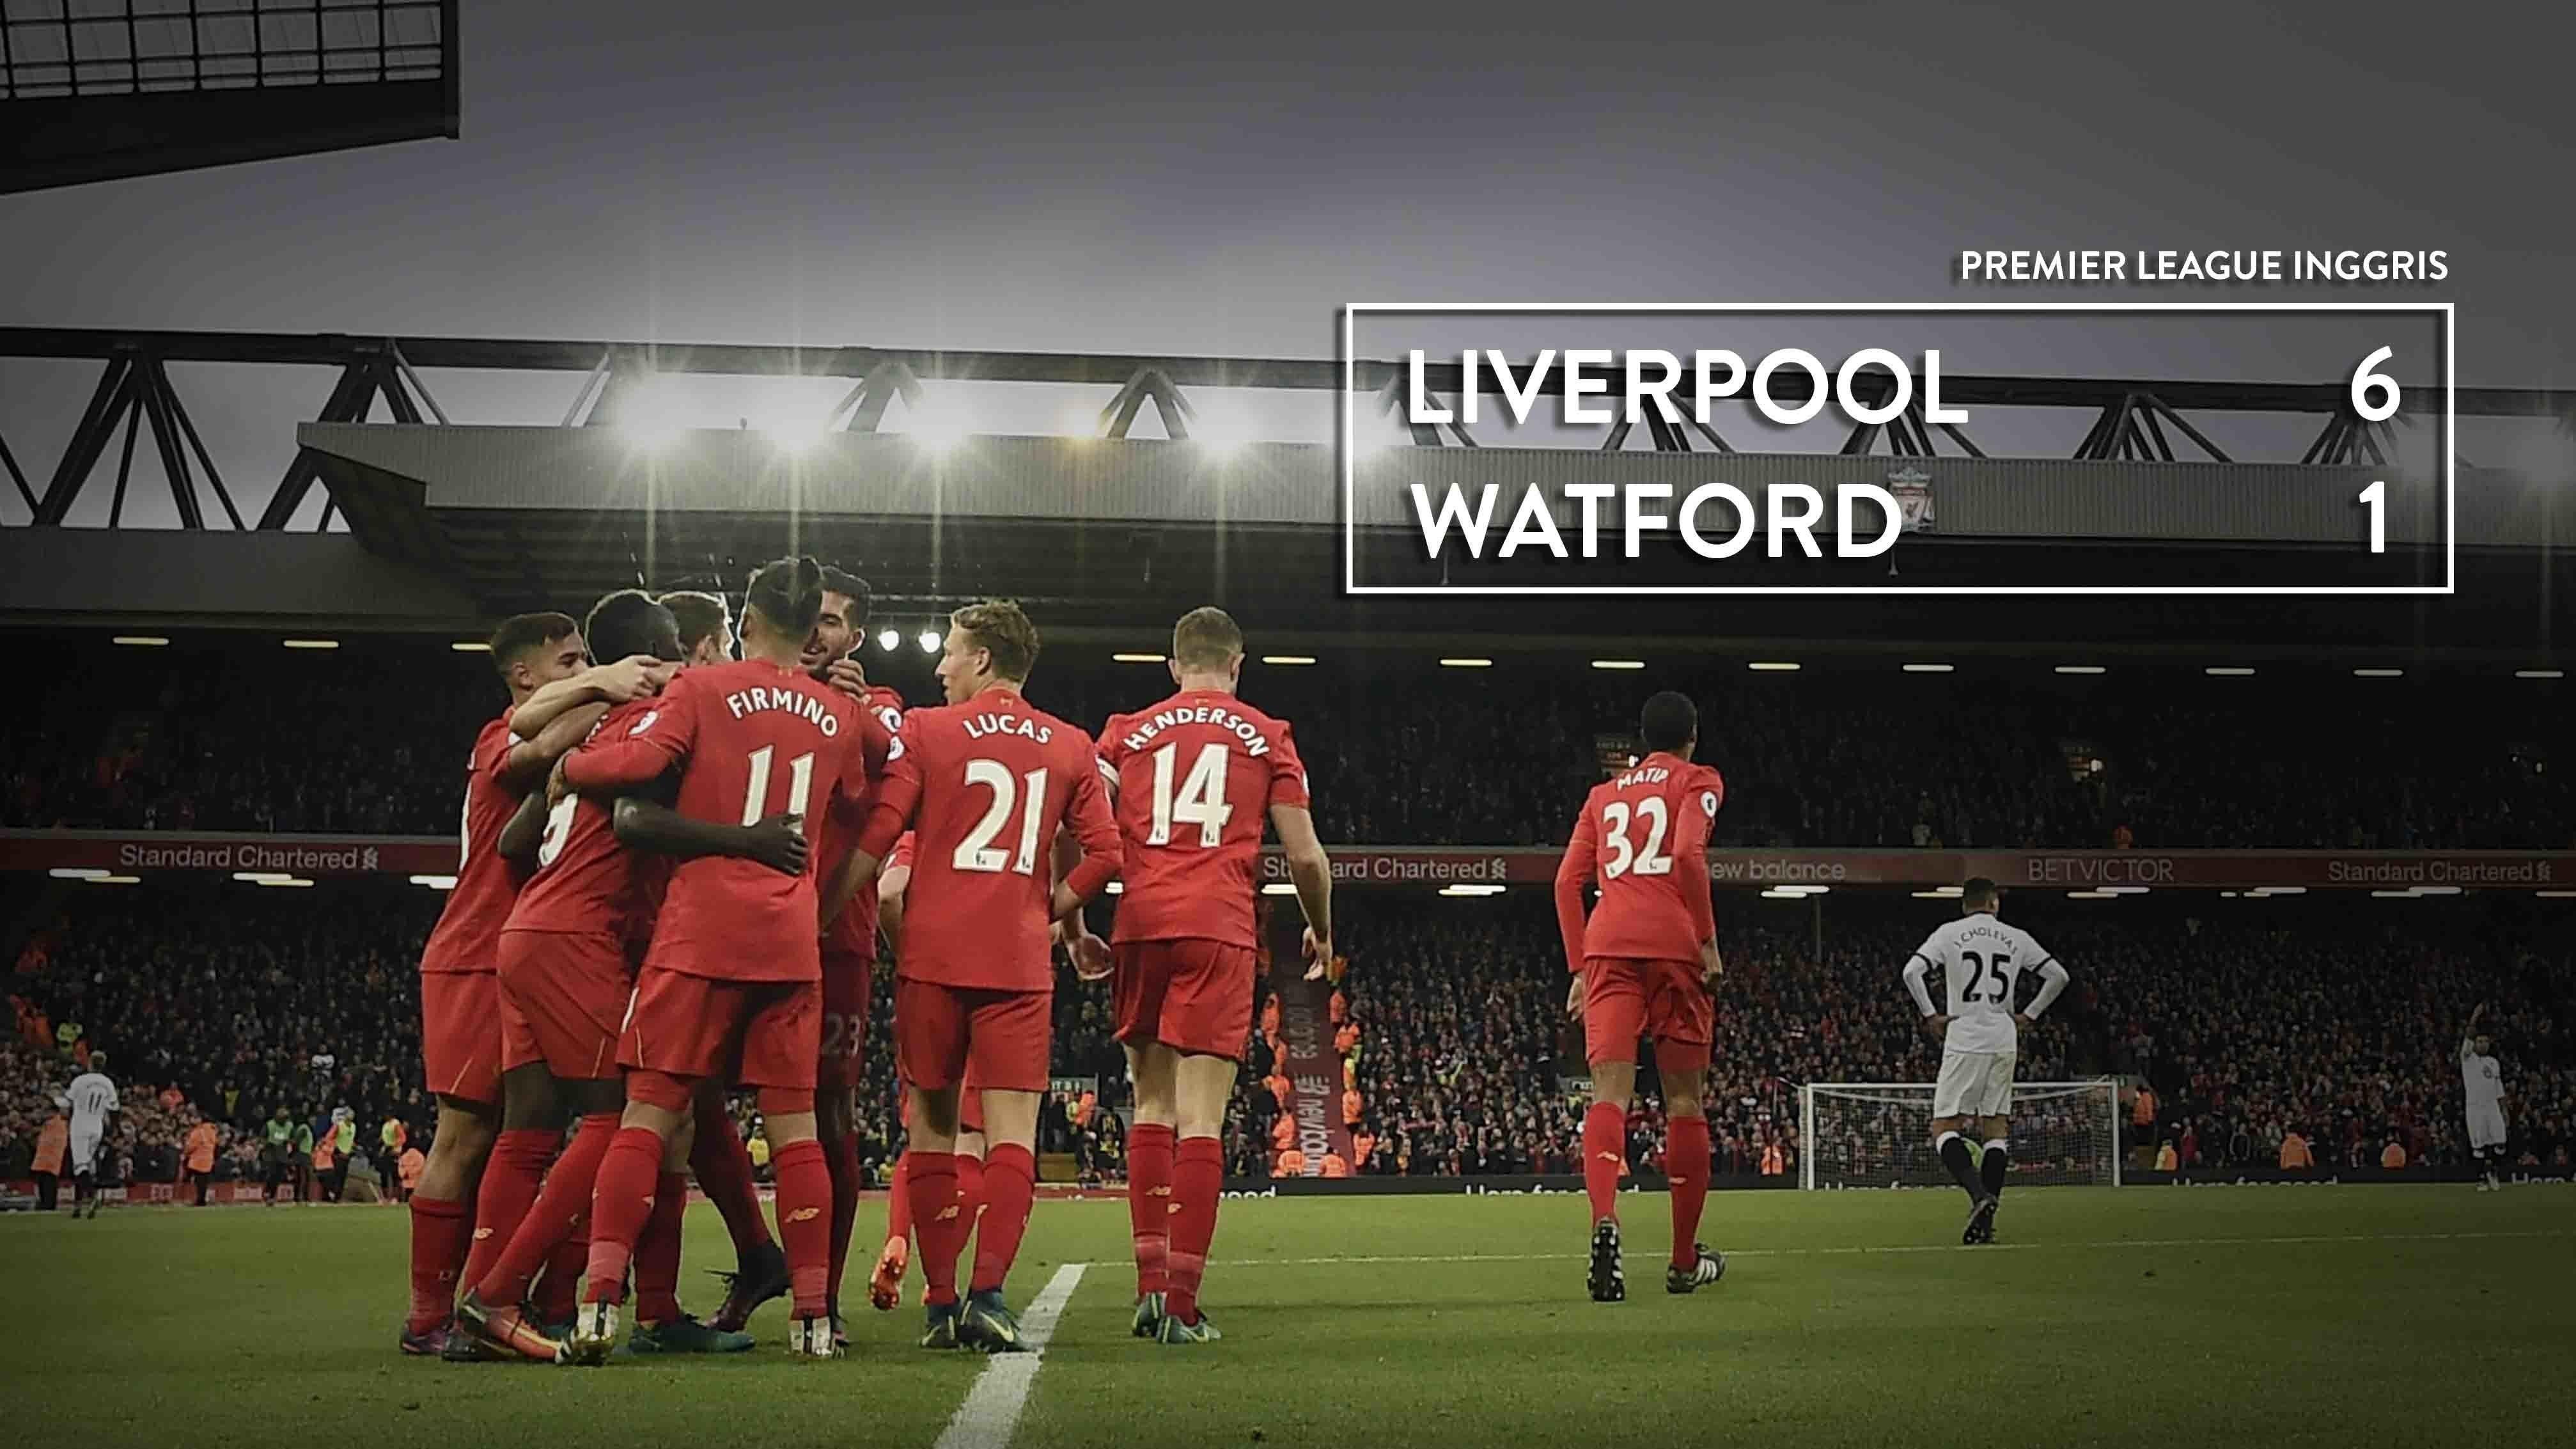 Прогноз на матч Ливерпуль - Уотфорд 17 марта 2018